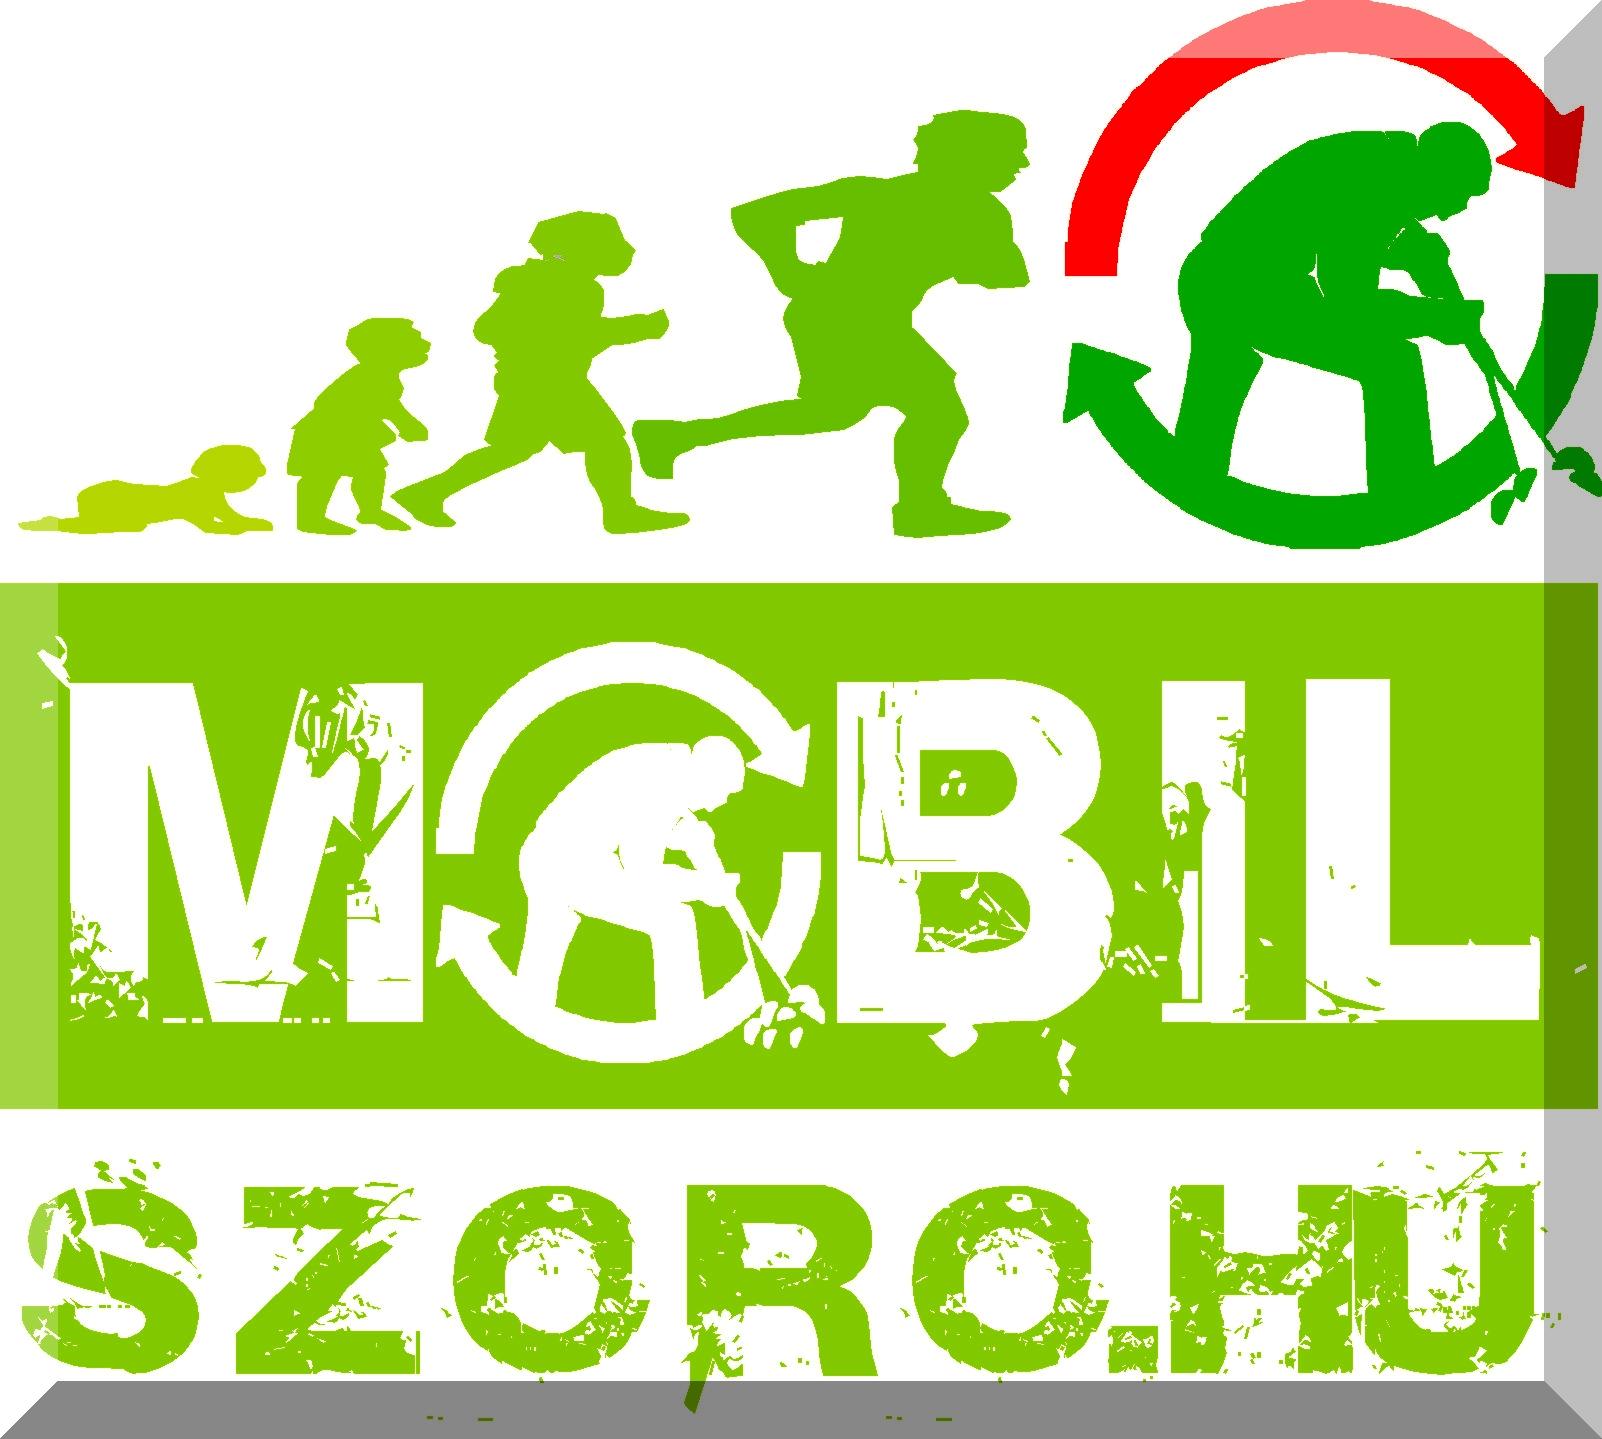 mobilszoro_logo_3D_button